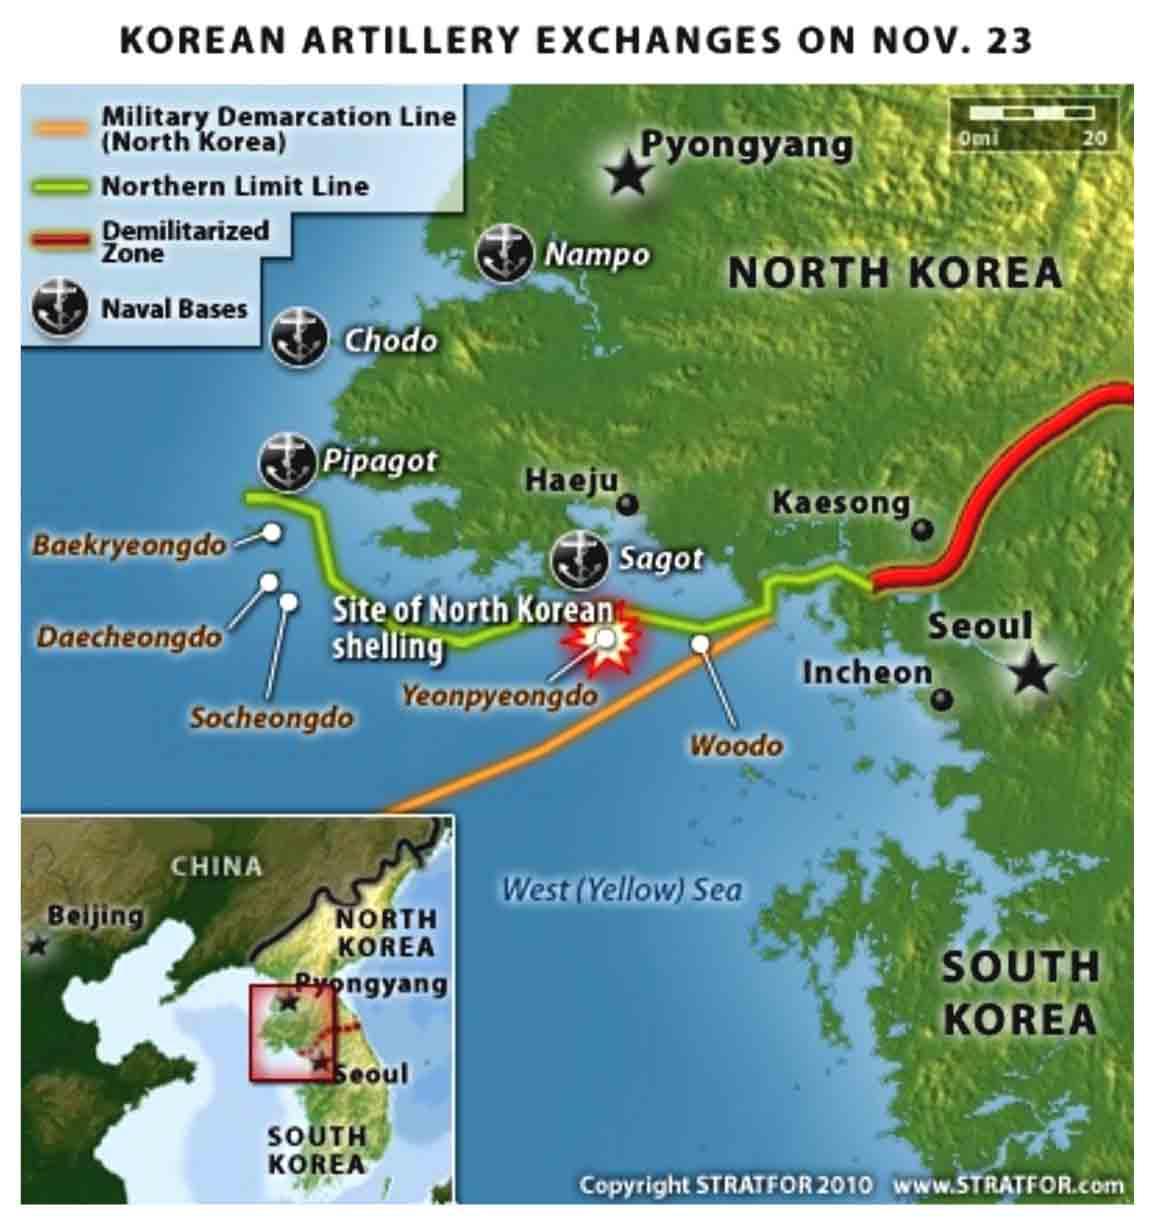 Korean Artillery Exchanges on Nov. 23